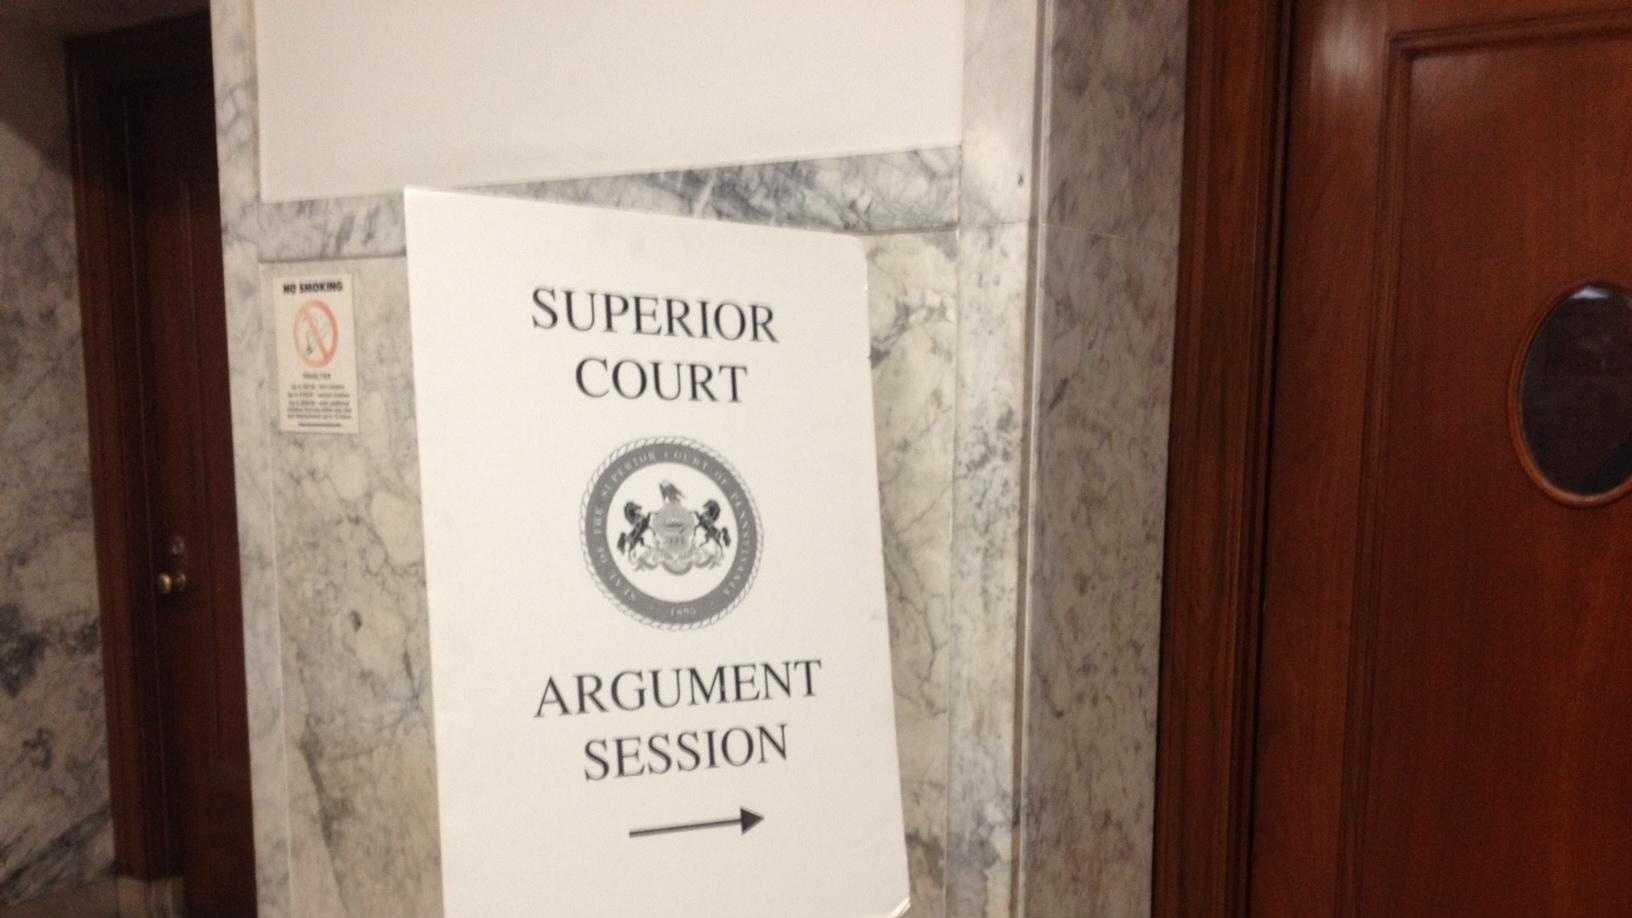 Superior Court (photo.JPG) - 30784006